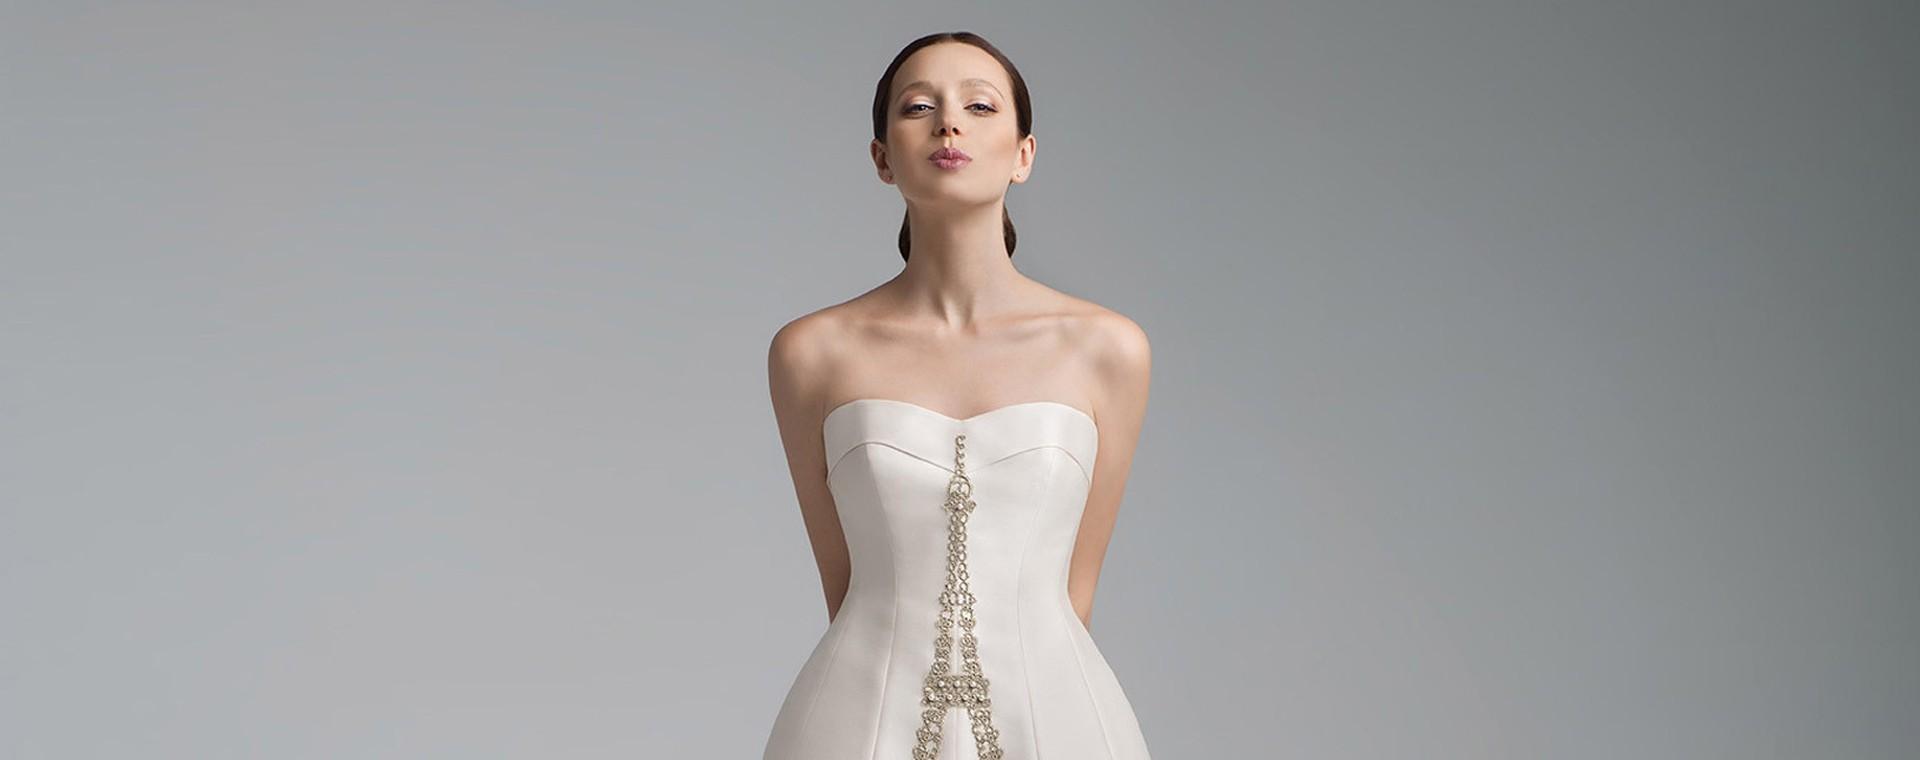 5 вариантов платьев-мини · NEVESTA.MOSCOW 2e367379feb